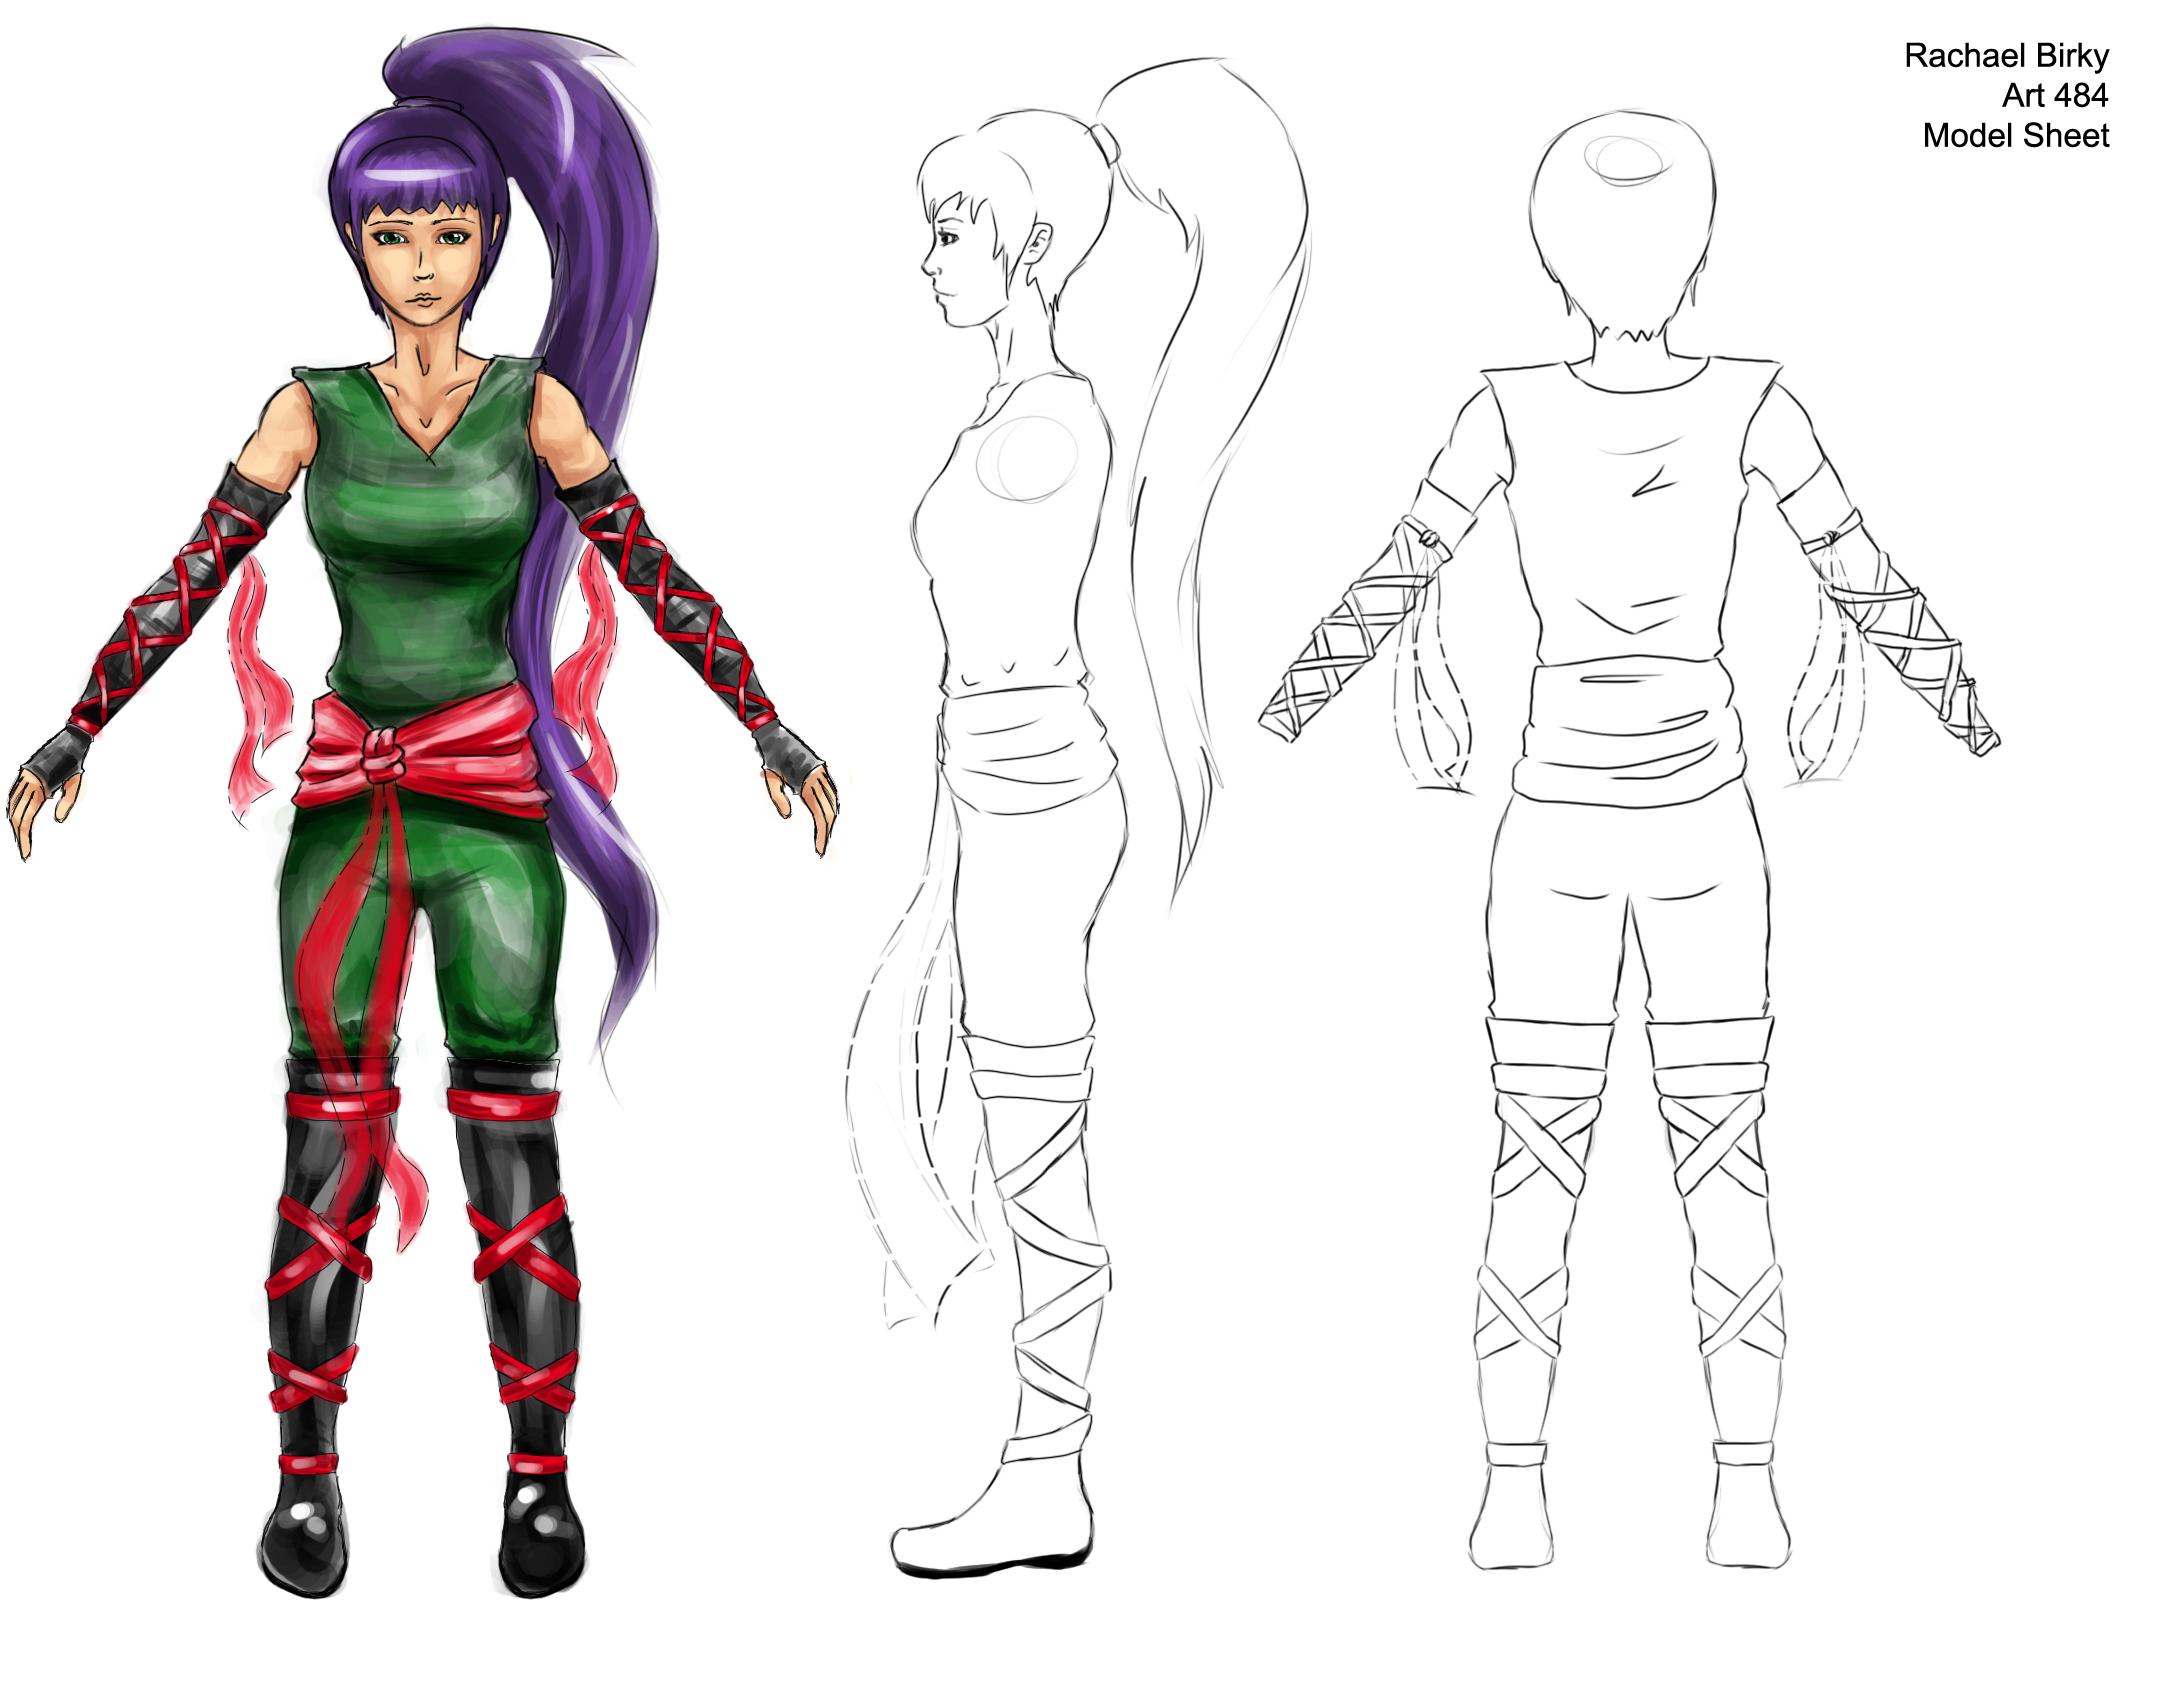 birky-character-design-2-color.jpg